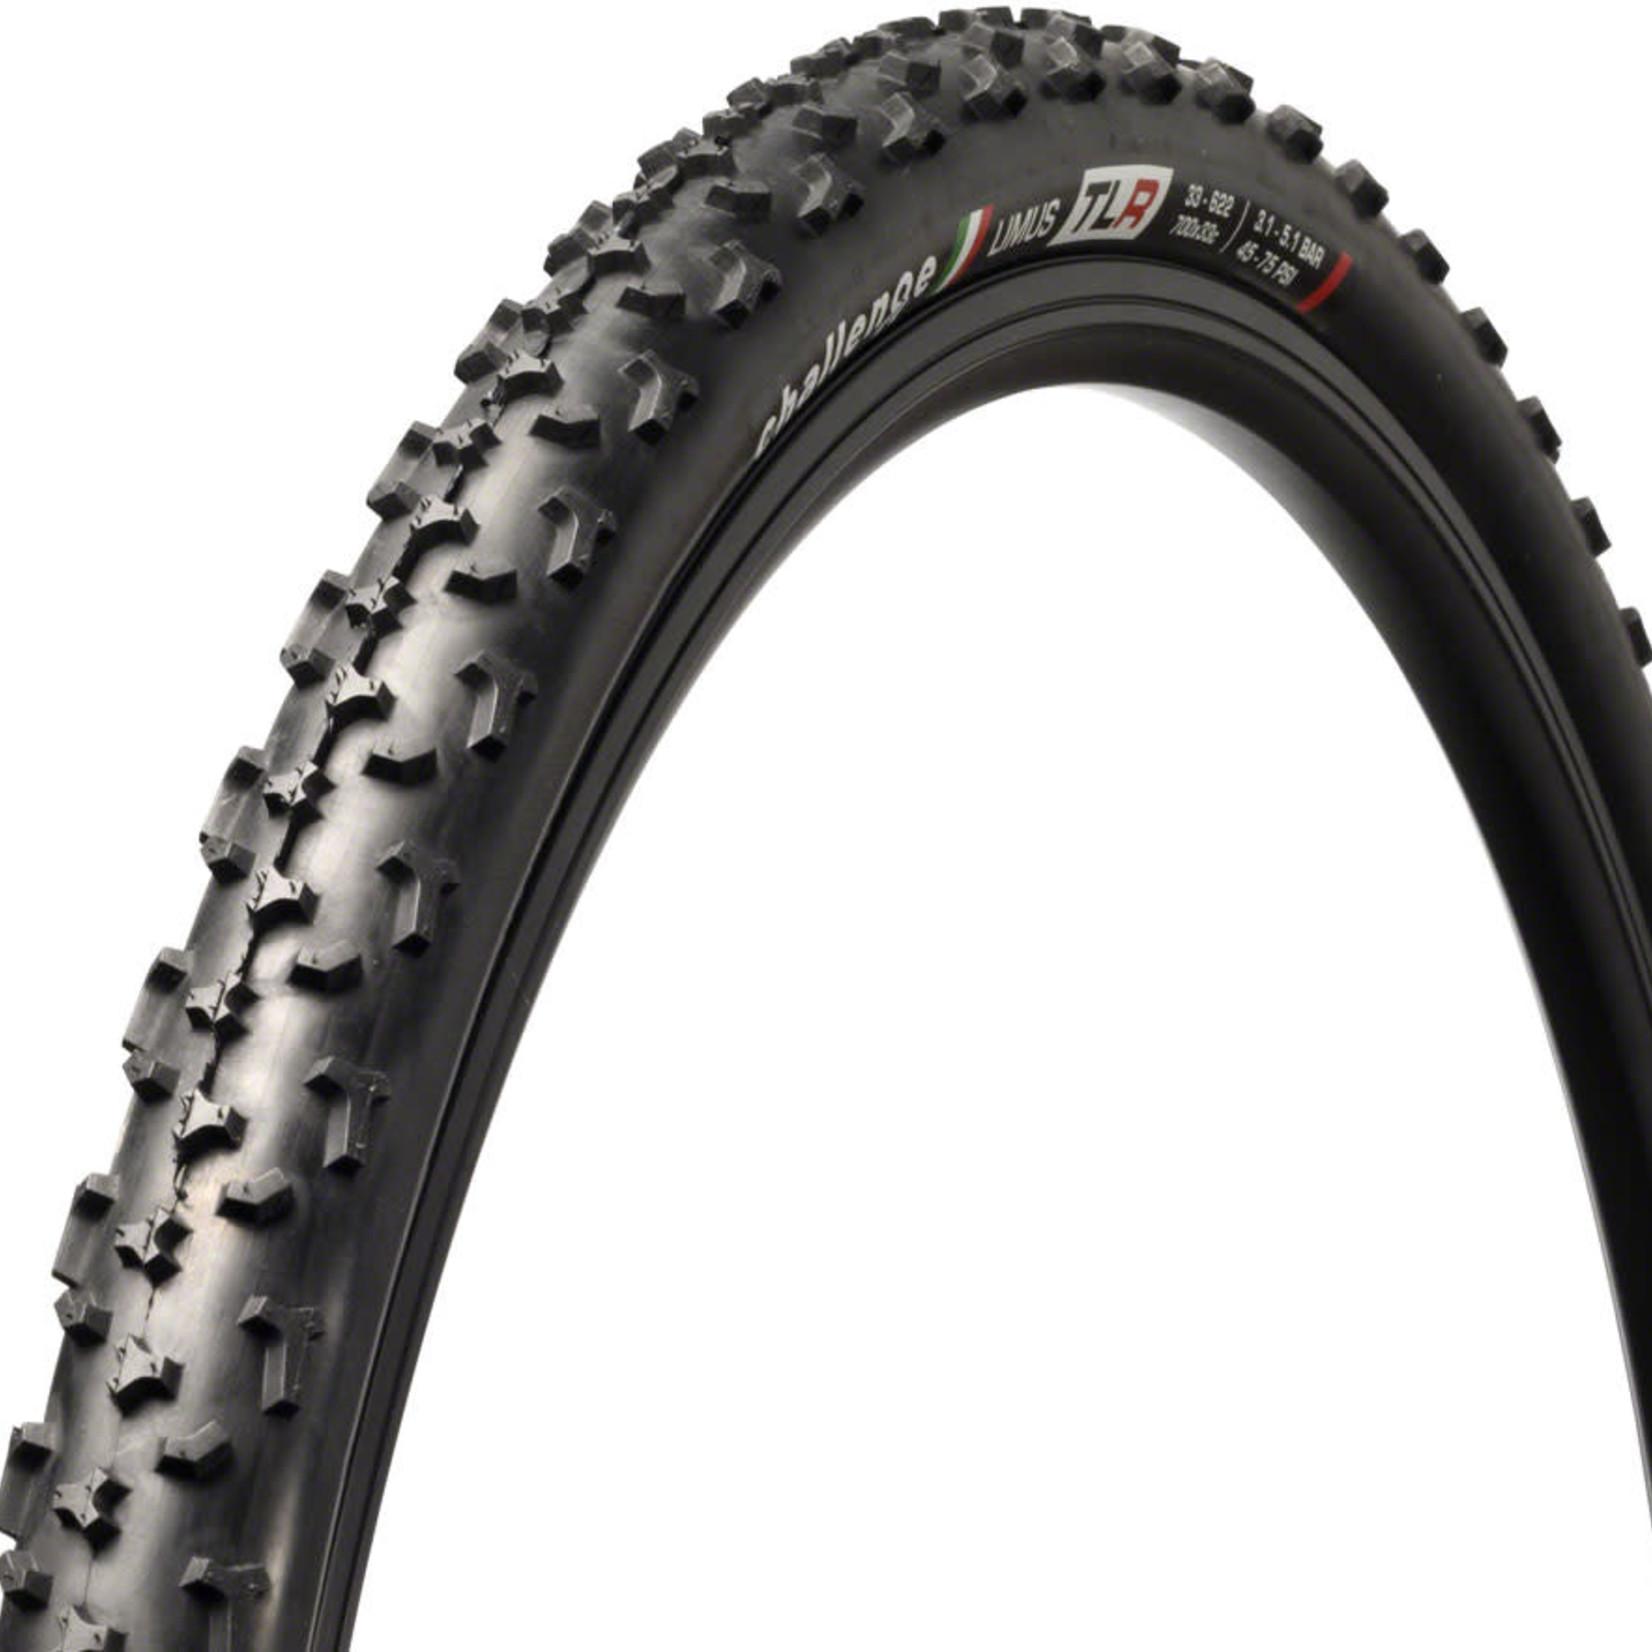 Challenge Challenge Limus Race Tire - 700 x 33, Tubeless, Folding, Black